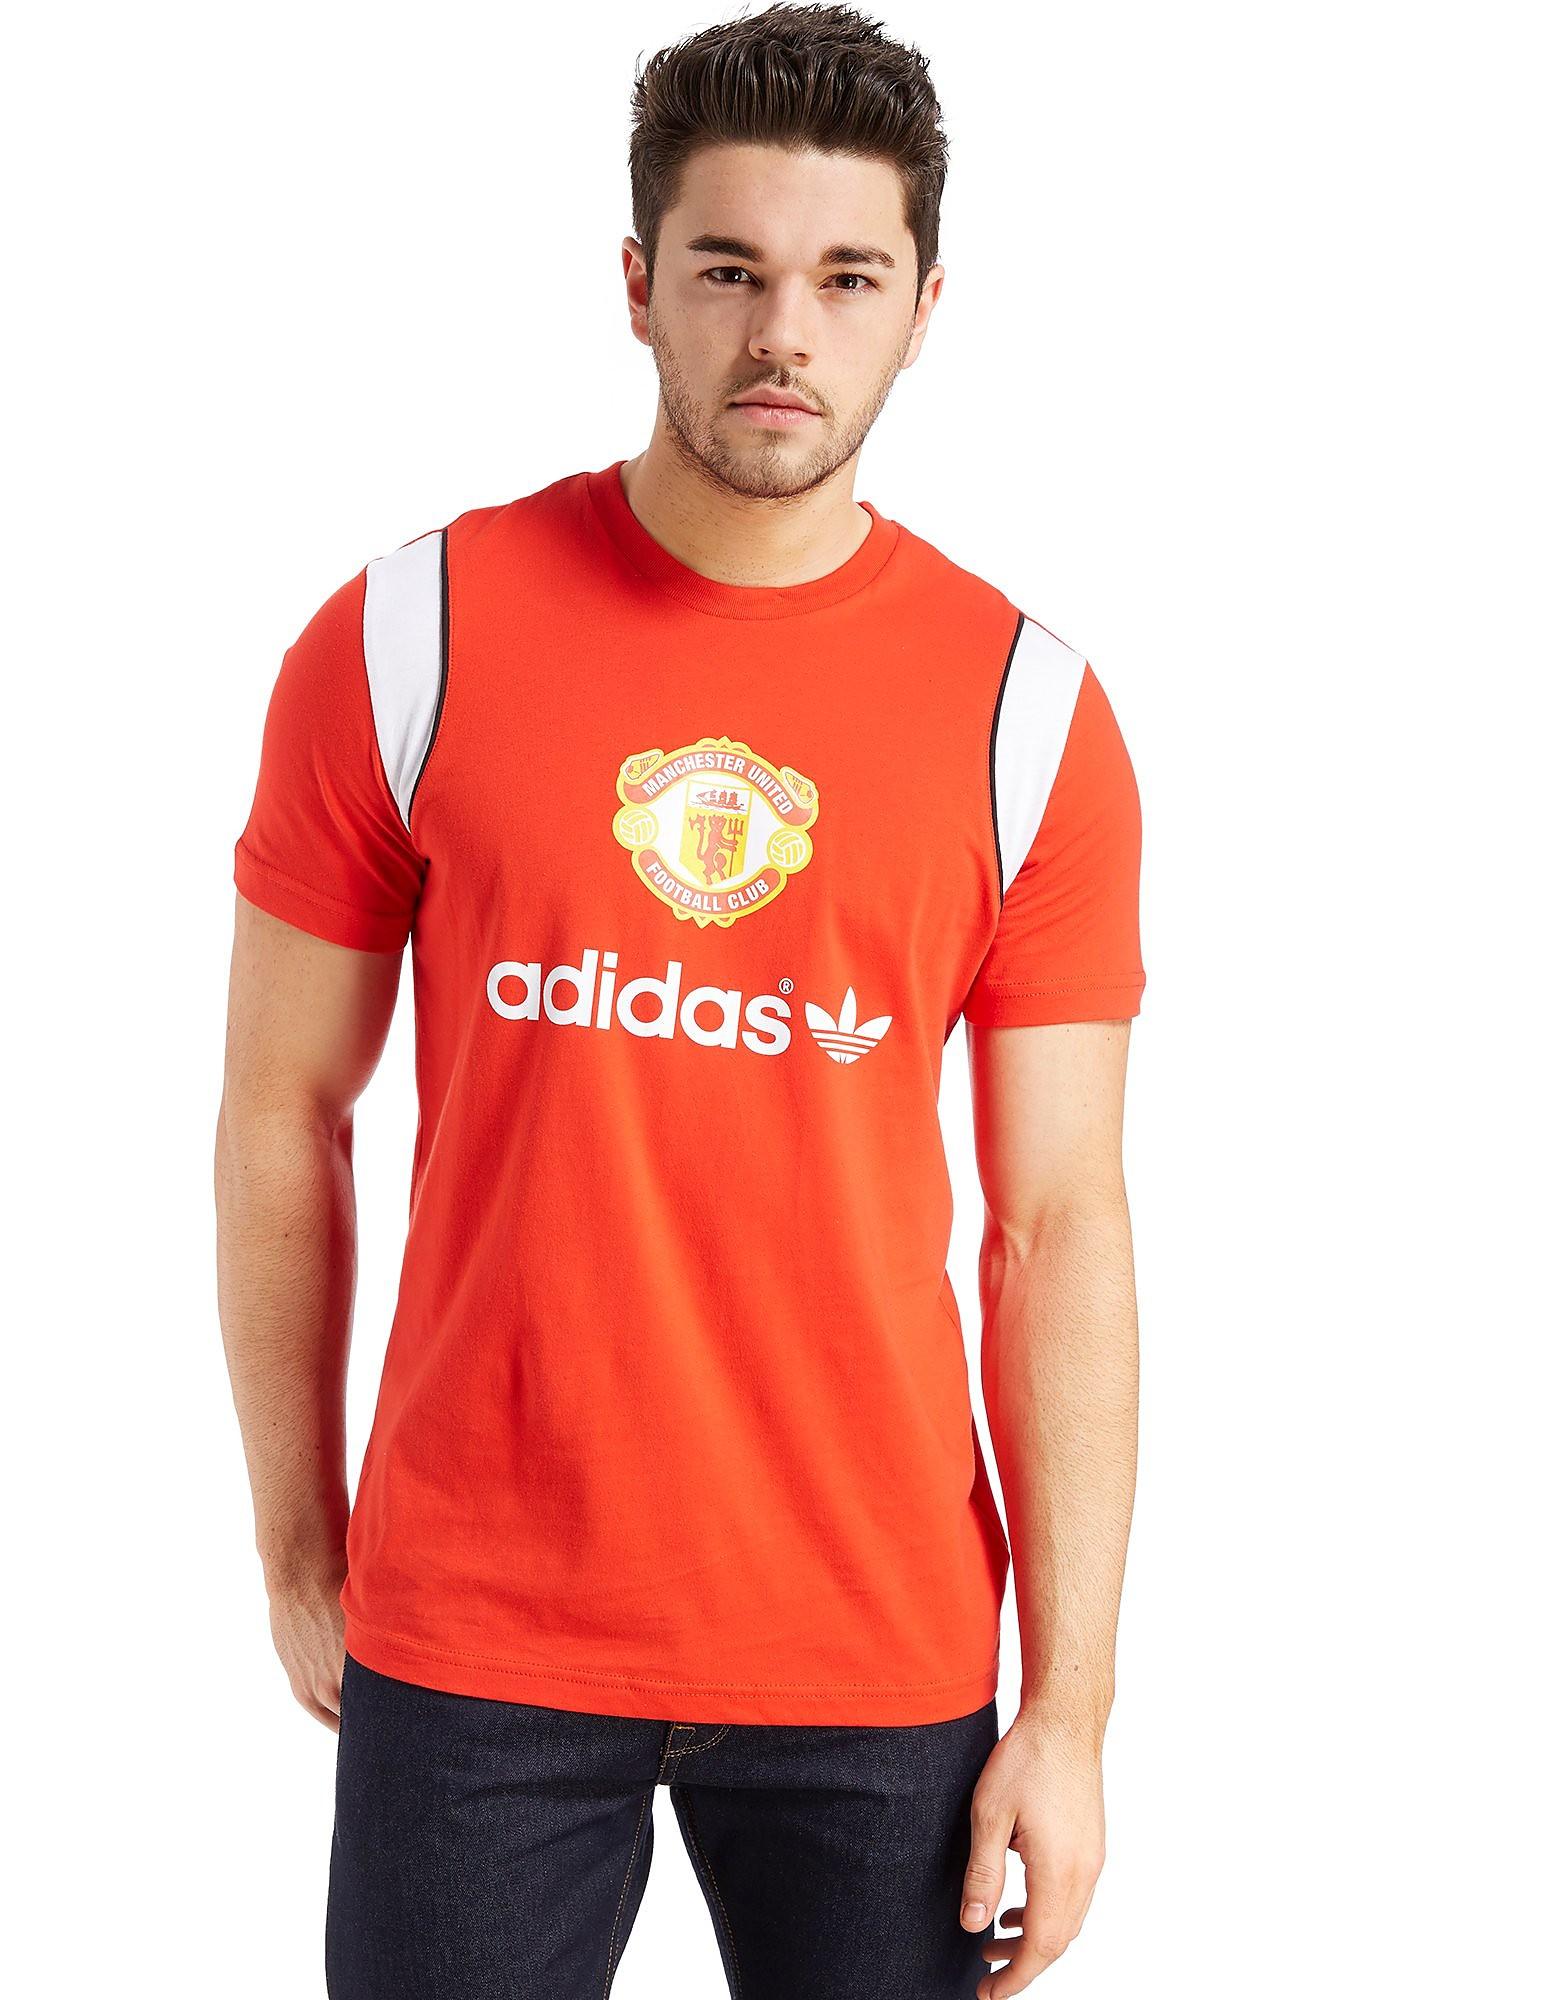 adidas Originals Manchester United FC T-Shirt